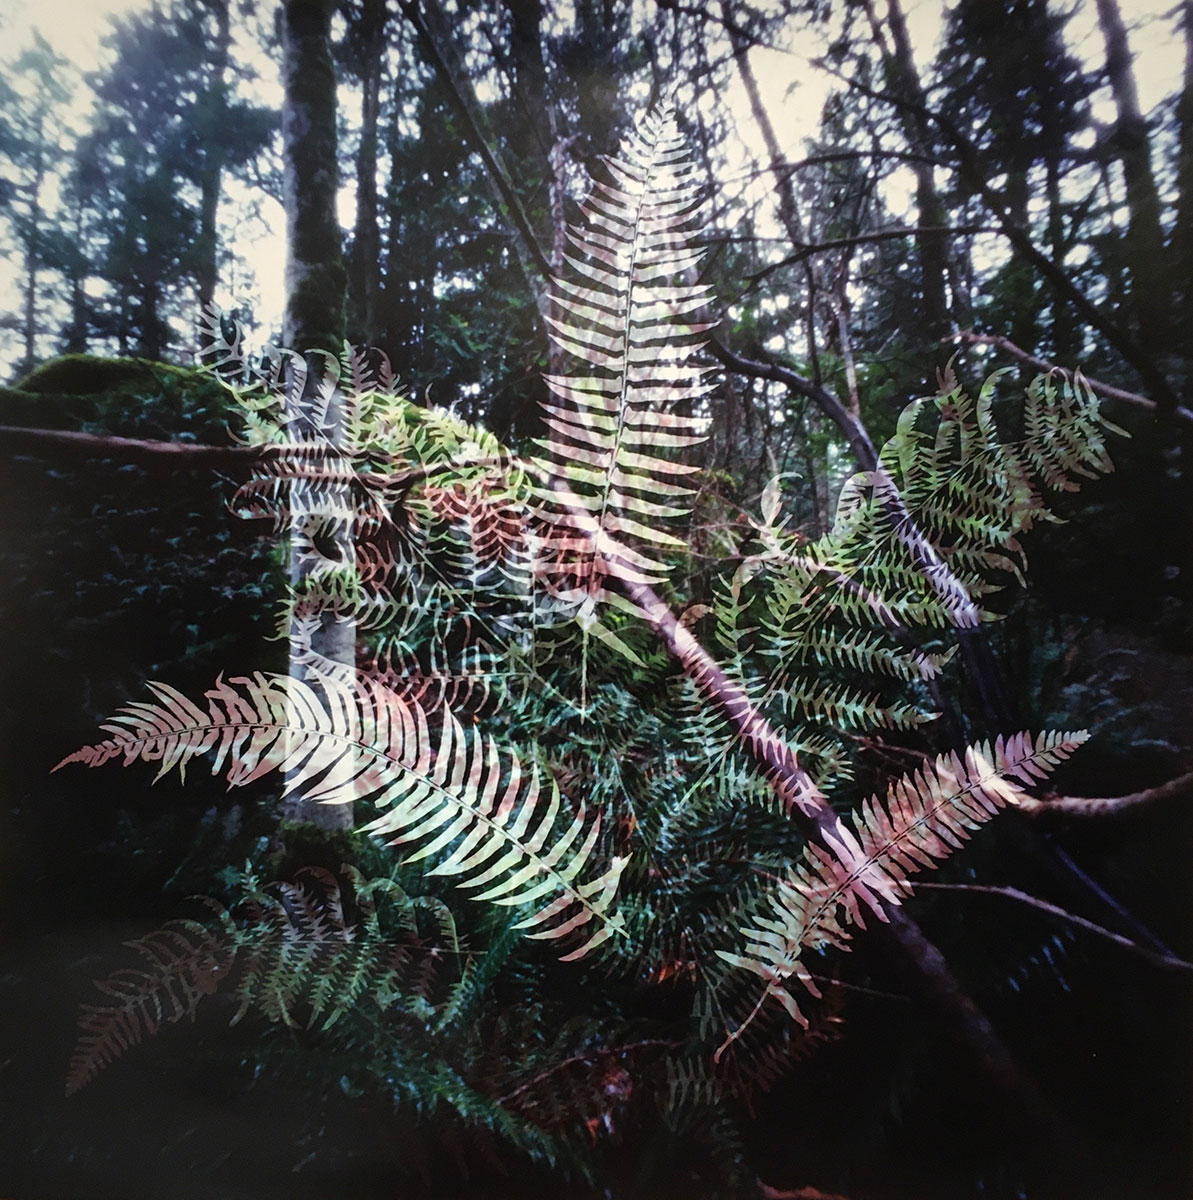 Understory 10, Bowen Island, British Columbia (2020)